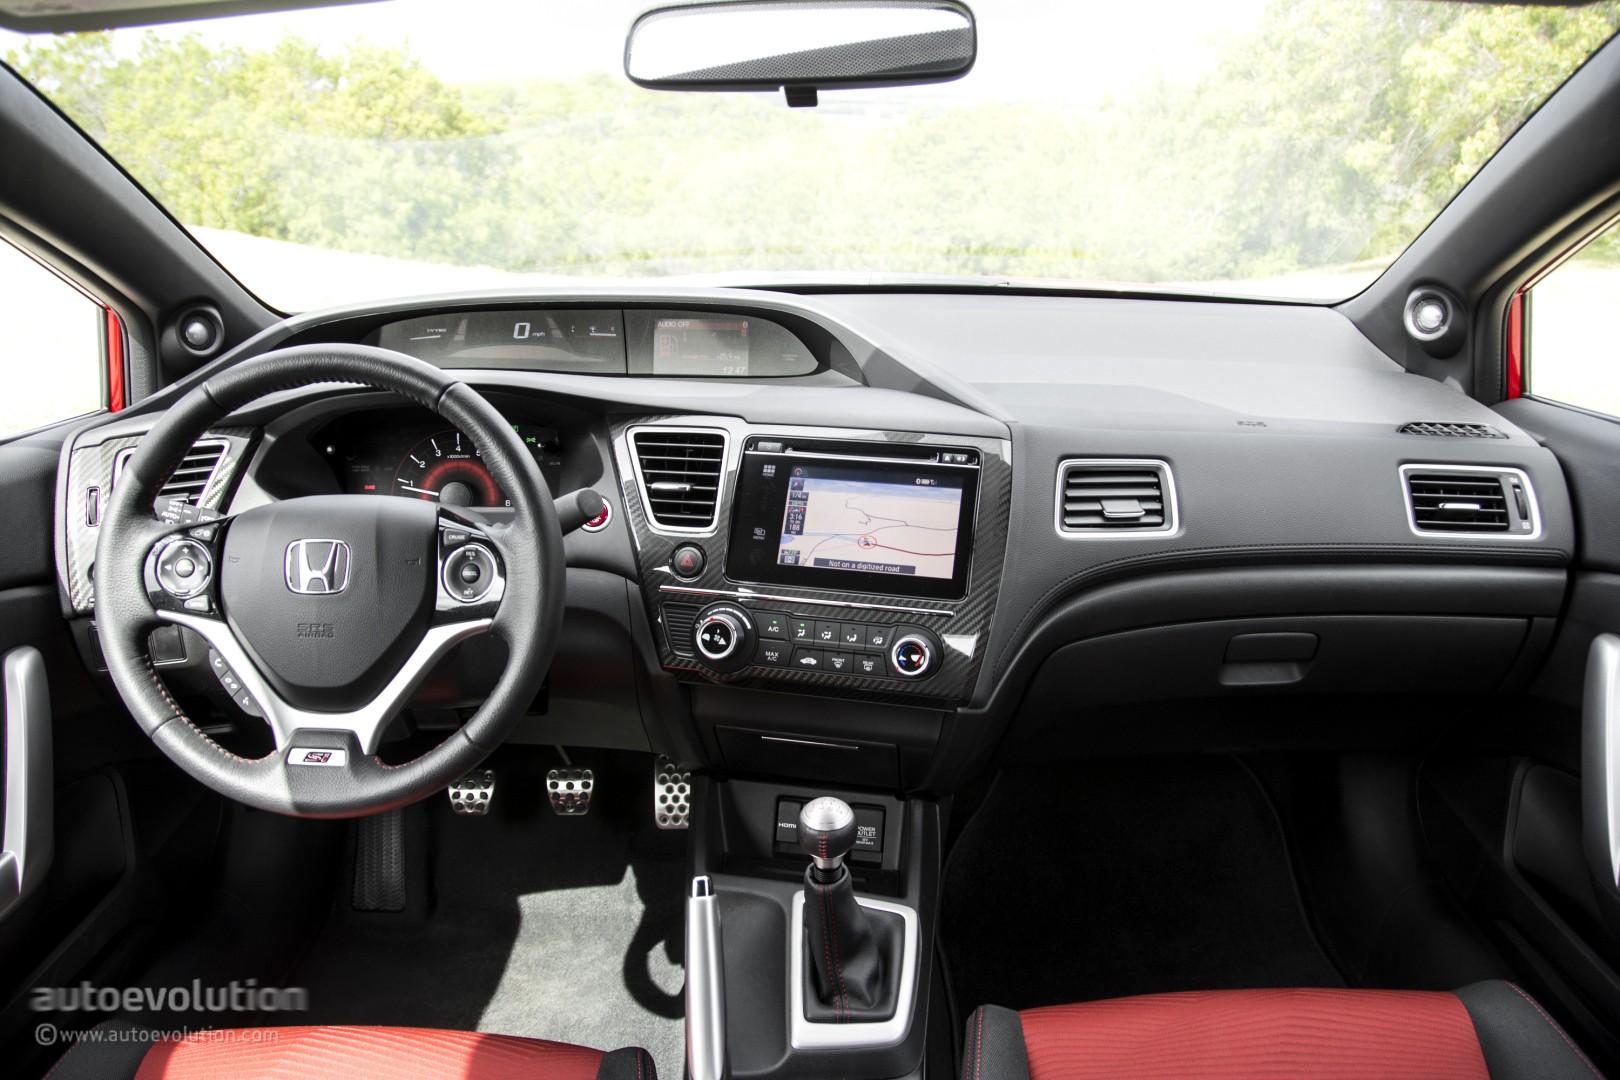 2015 Honda Civic Si Coupe Review - autoevolution